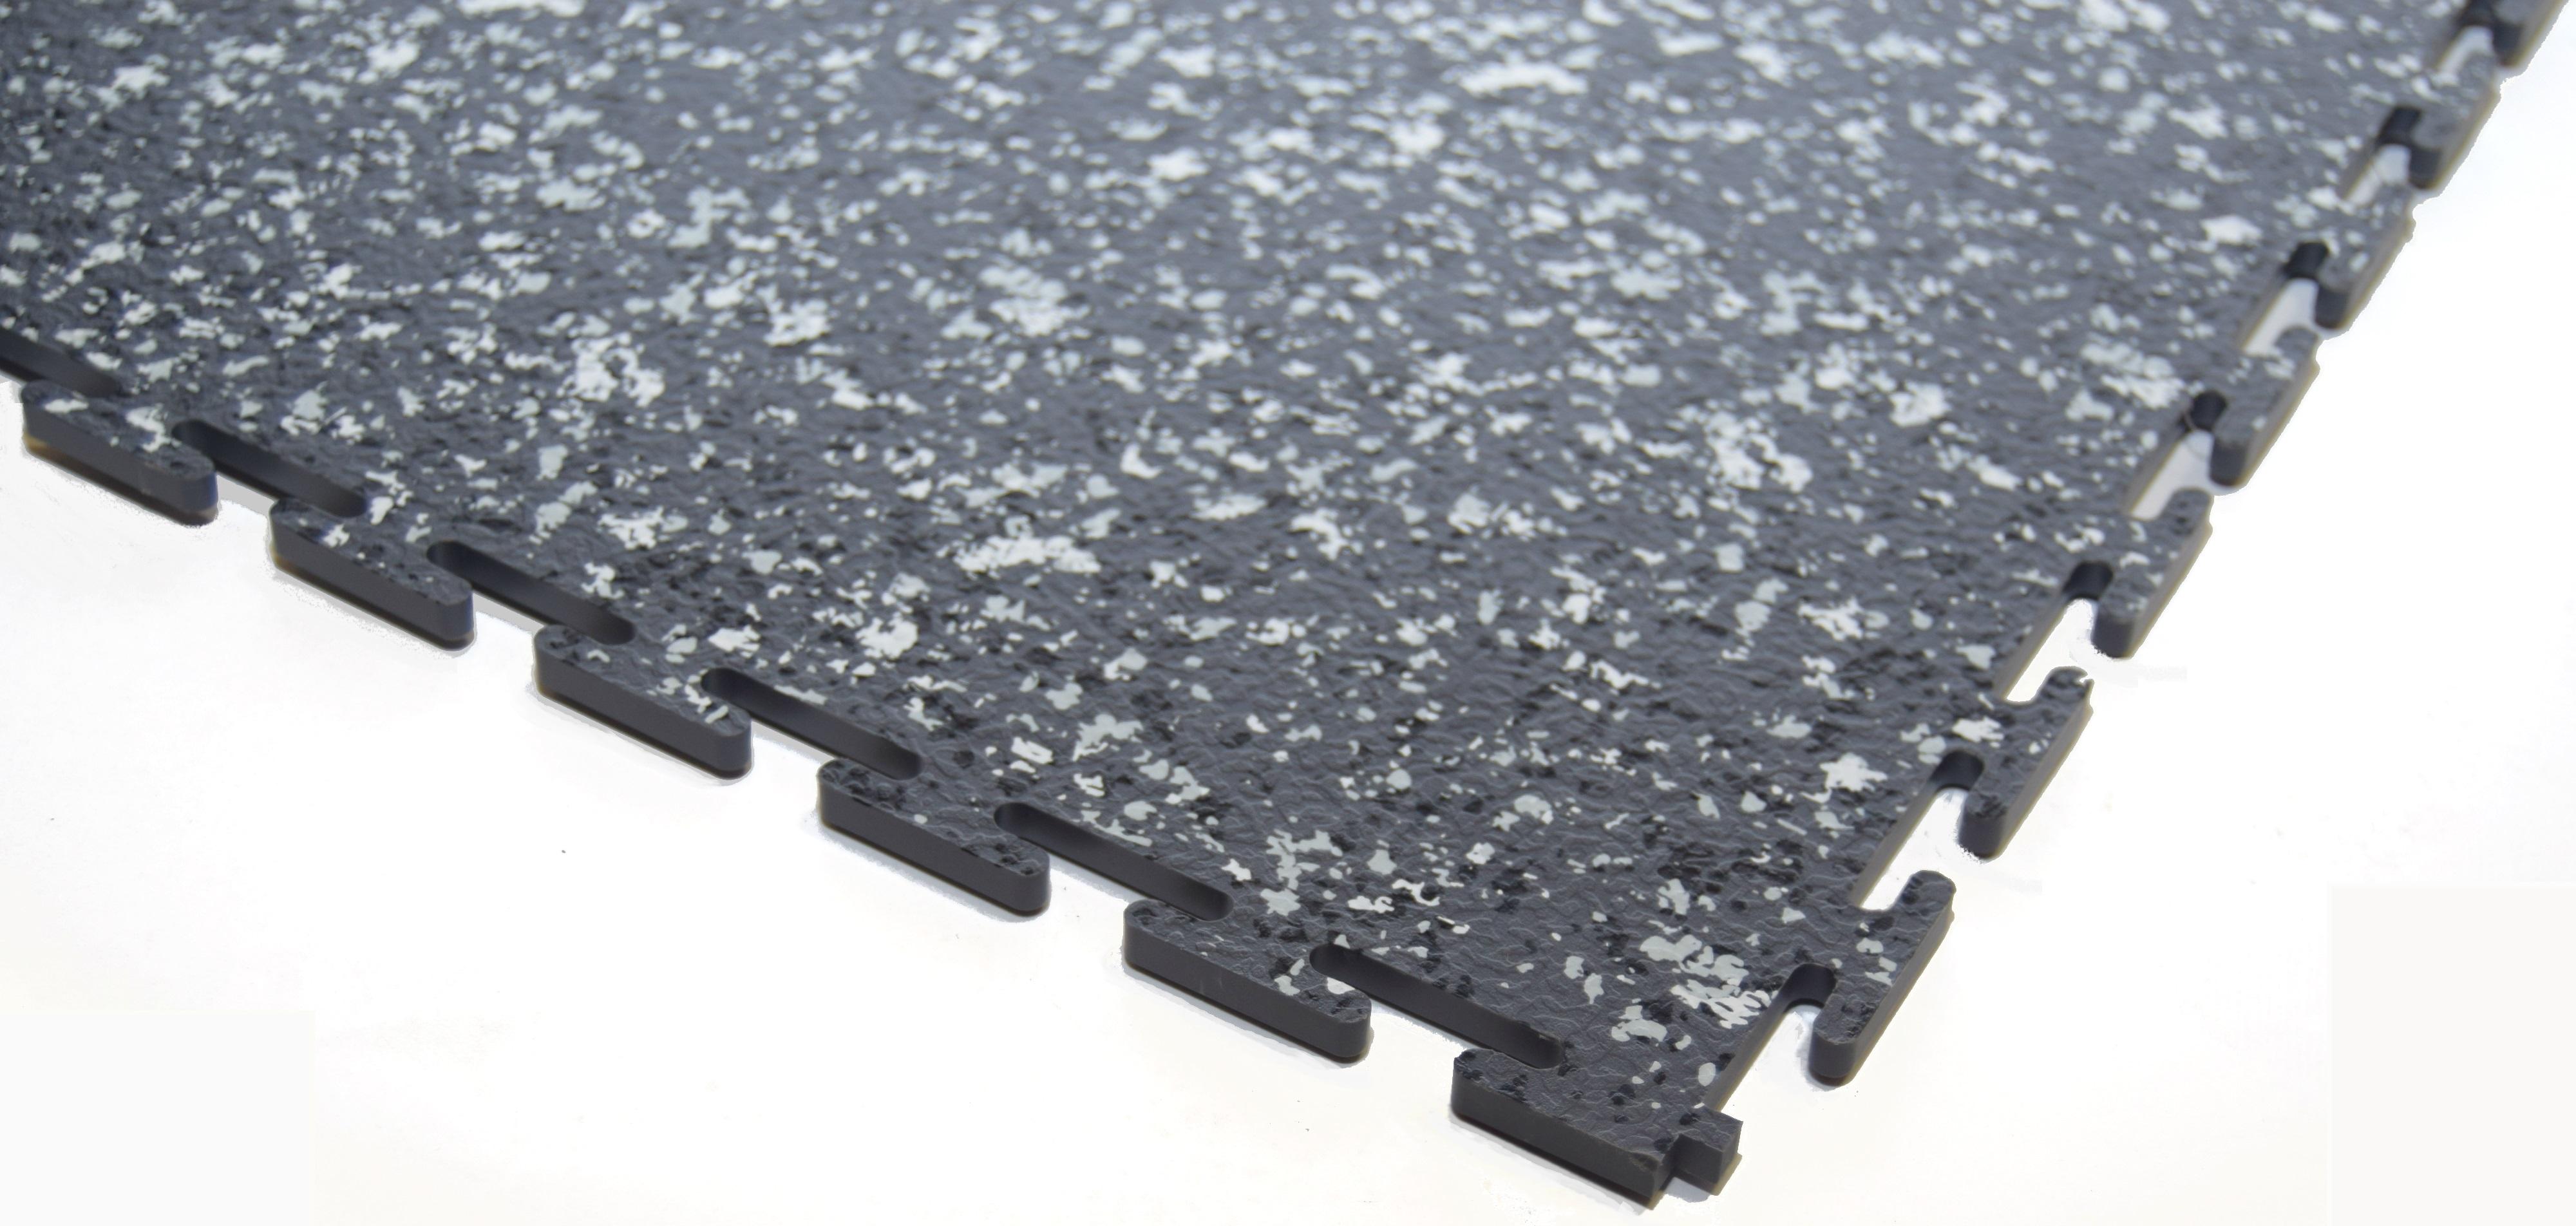 neu im programm flexi tile granit pvc fu bodenbelag pvc fliesen und industrieboden. Black Bedroom Furniture Sets. Home Design Ideas